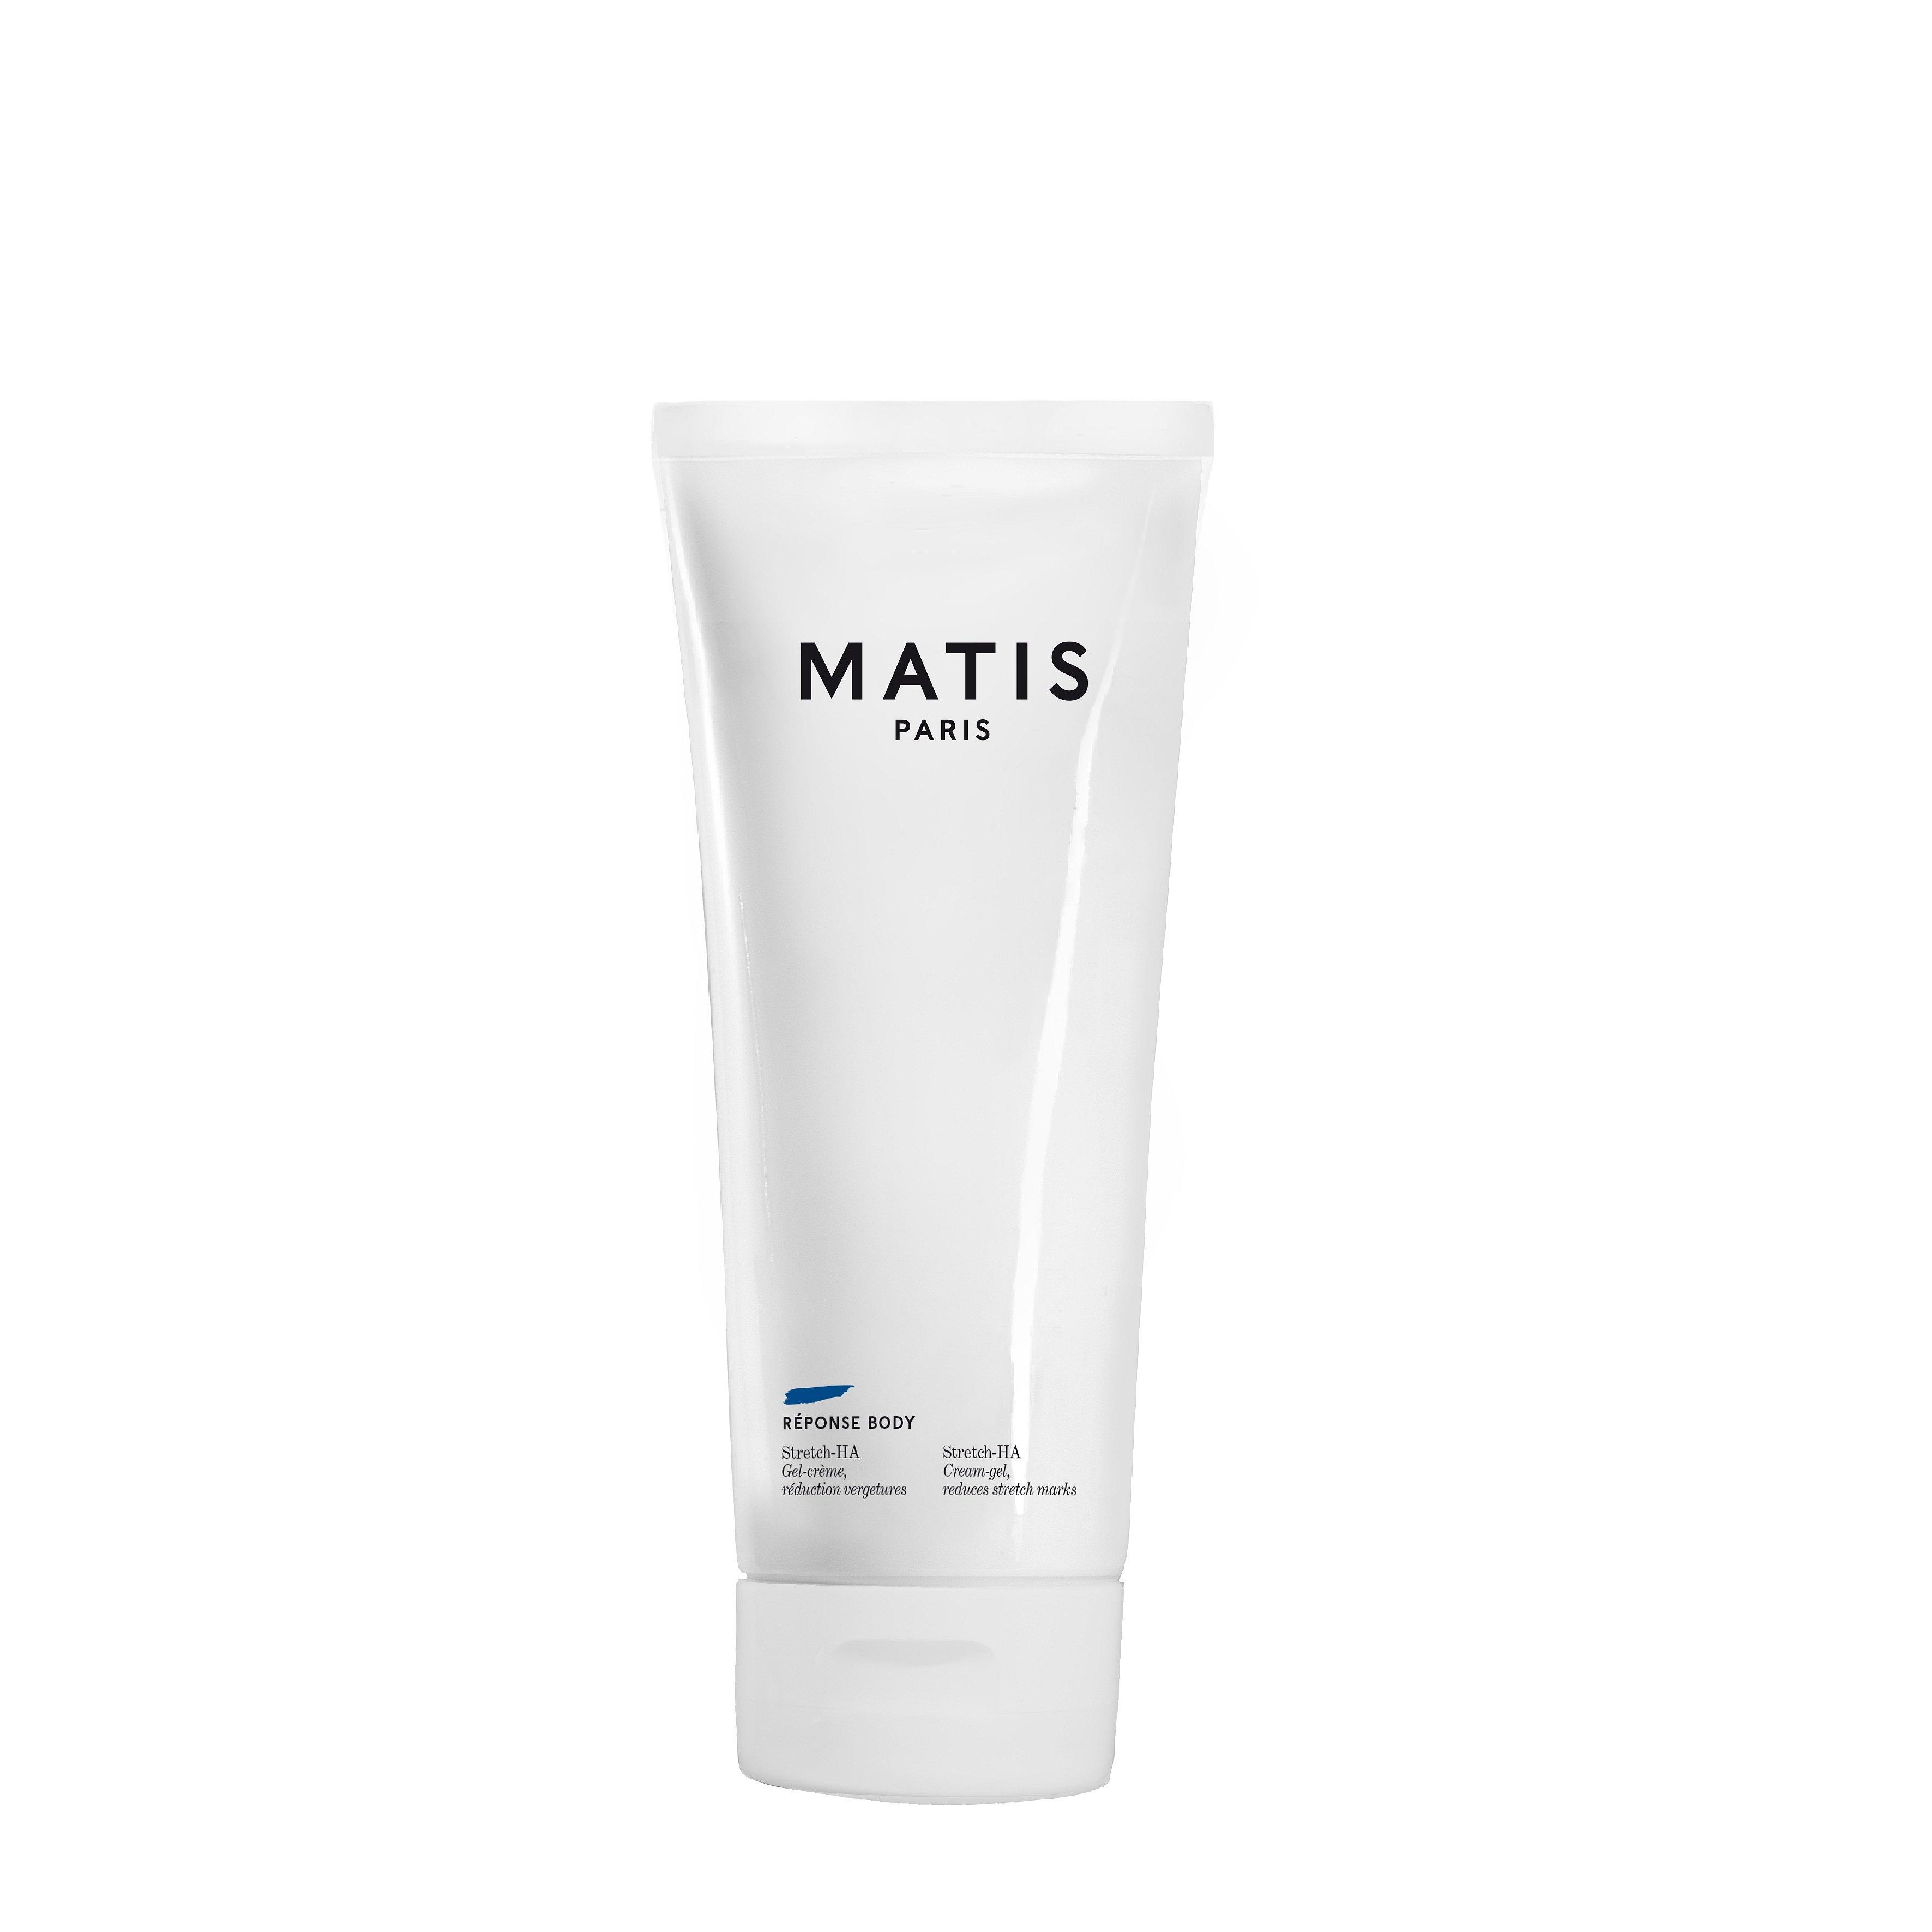 MATIS RÉPONSE BODY-Stretch-HA - Krém/gel na strie 200ml